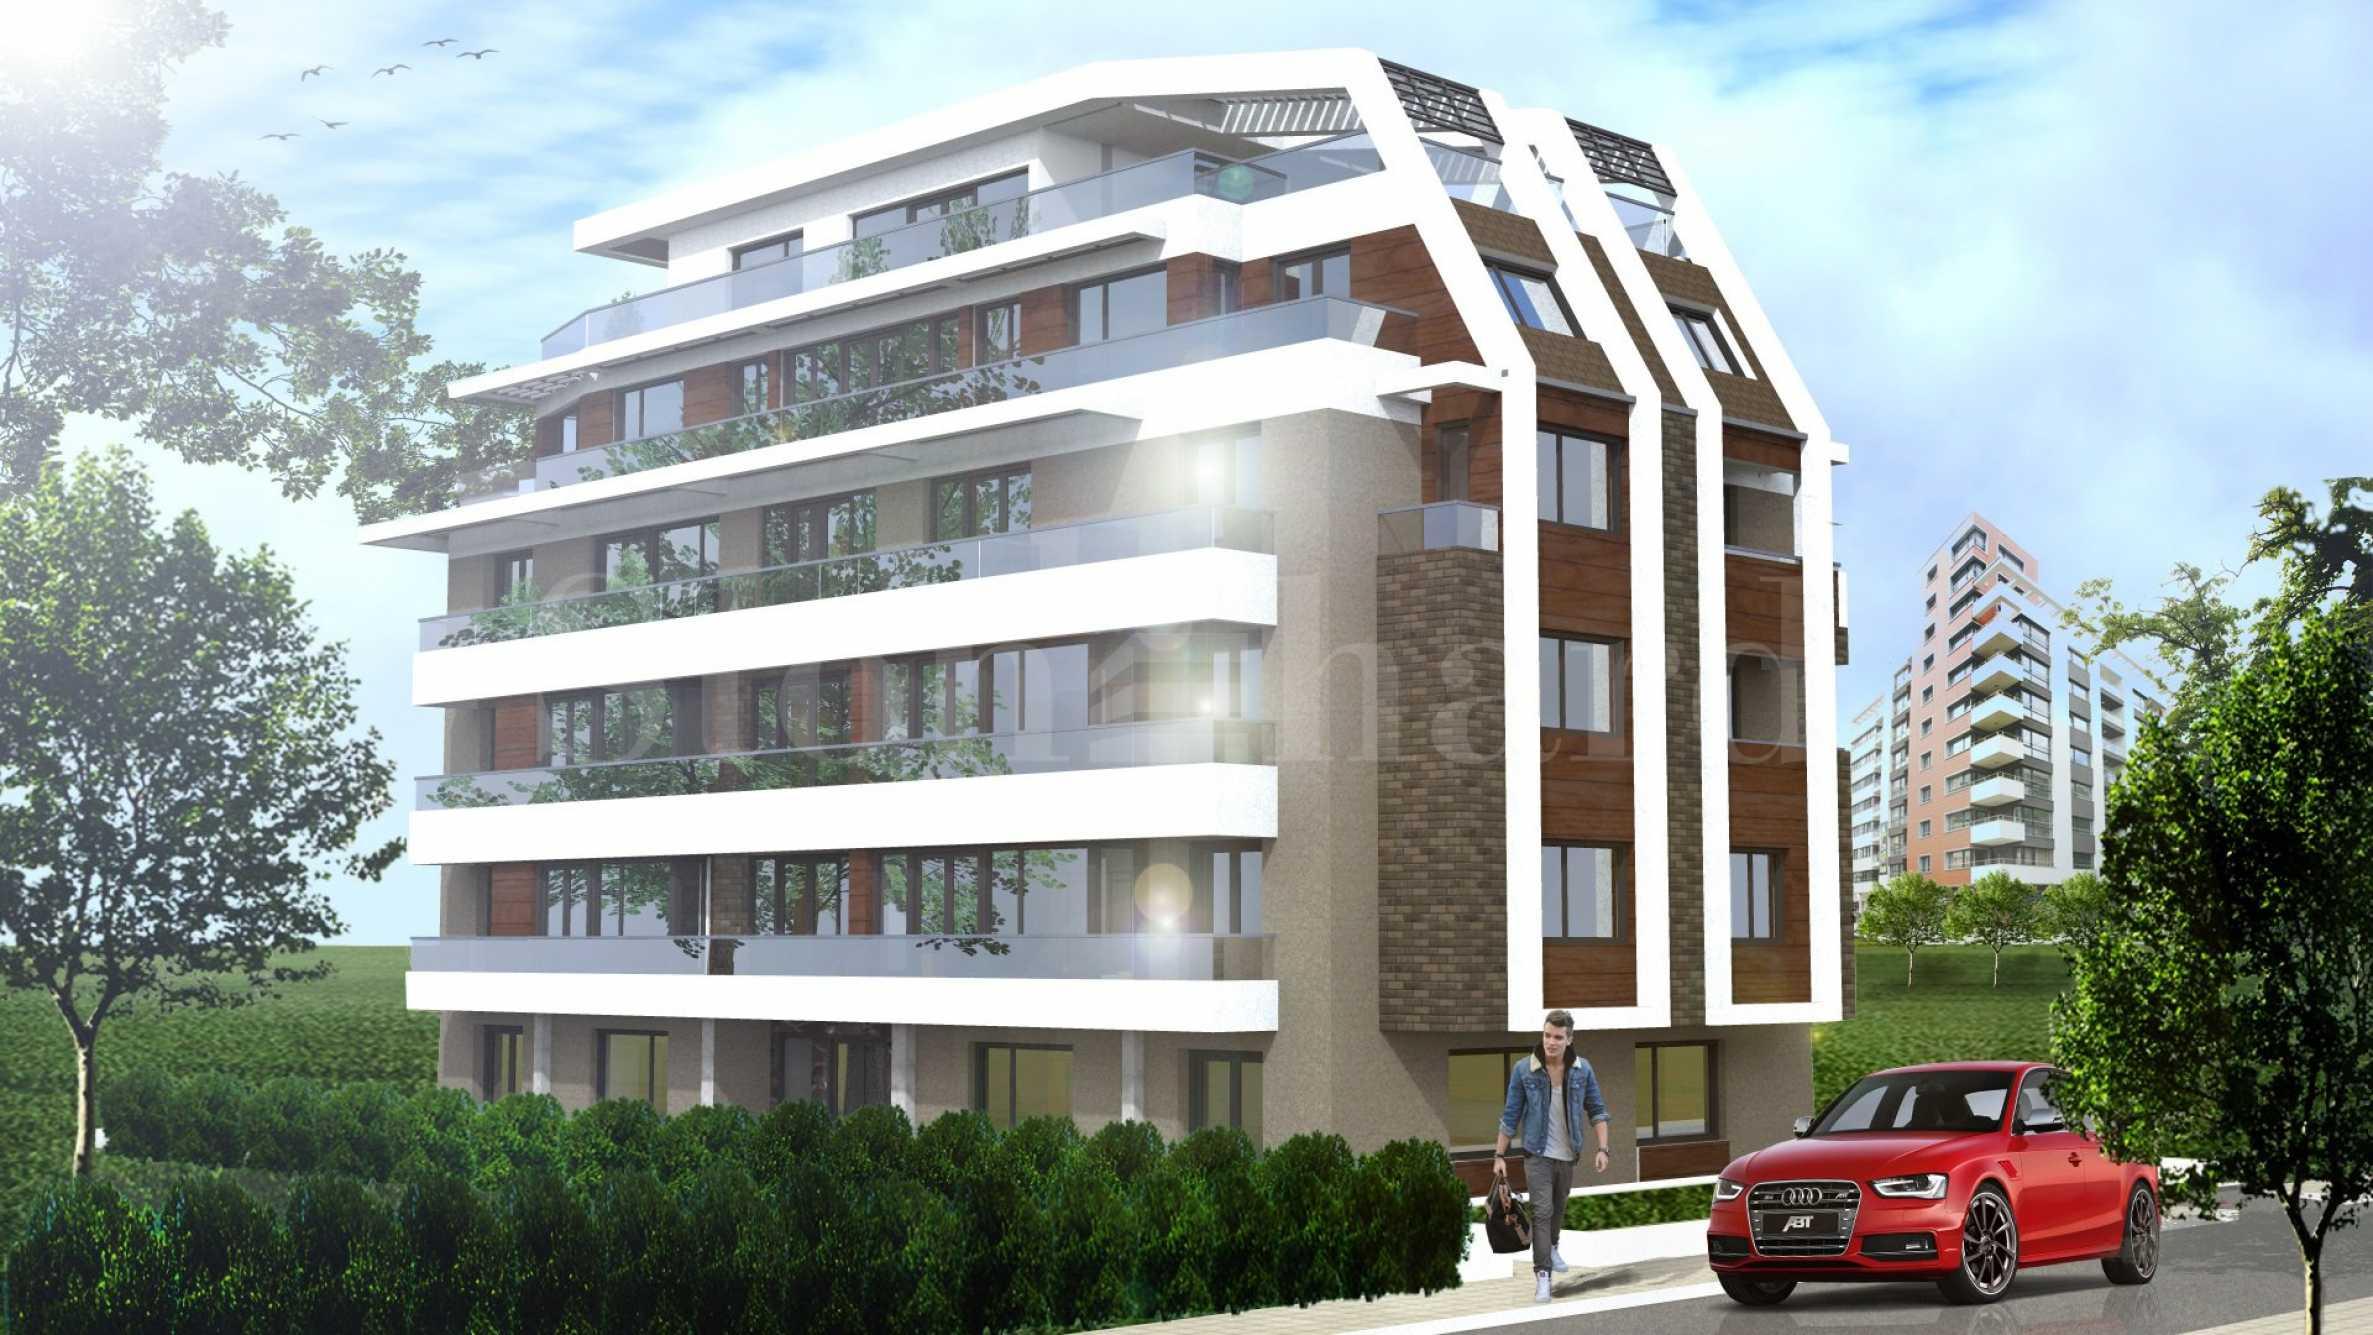 Просторни апартаменти в атрактивна сграда в кв.Изгрев2 - Stonehard